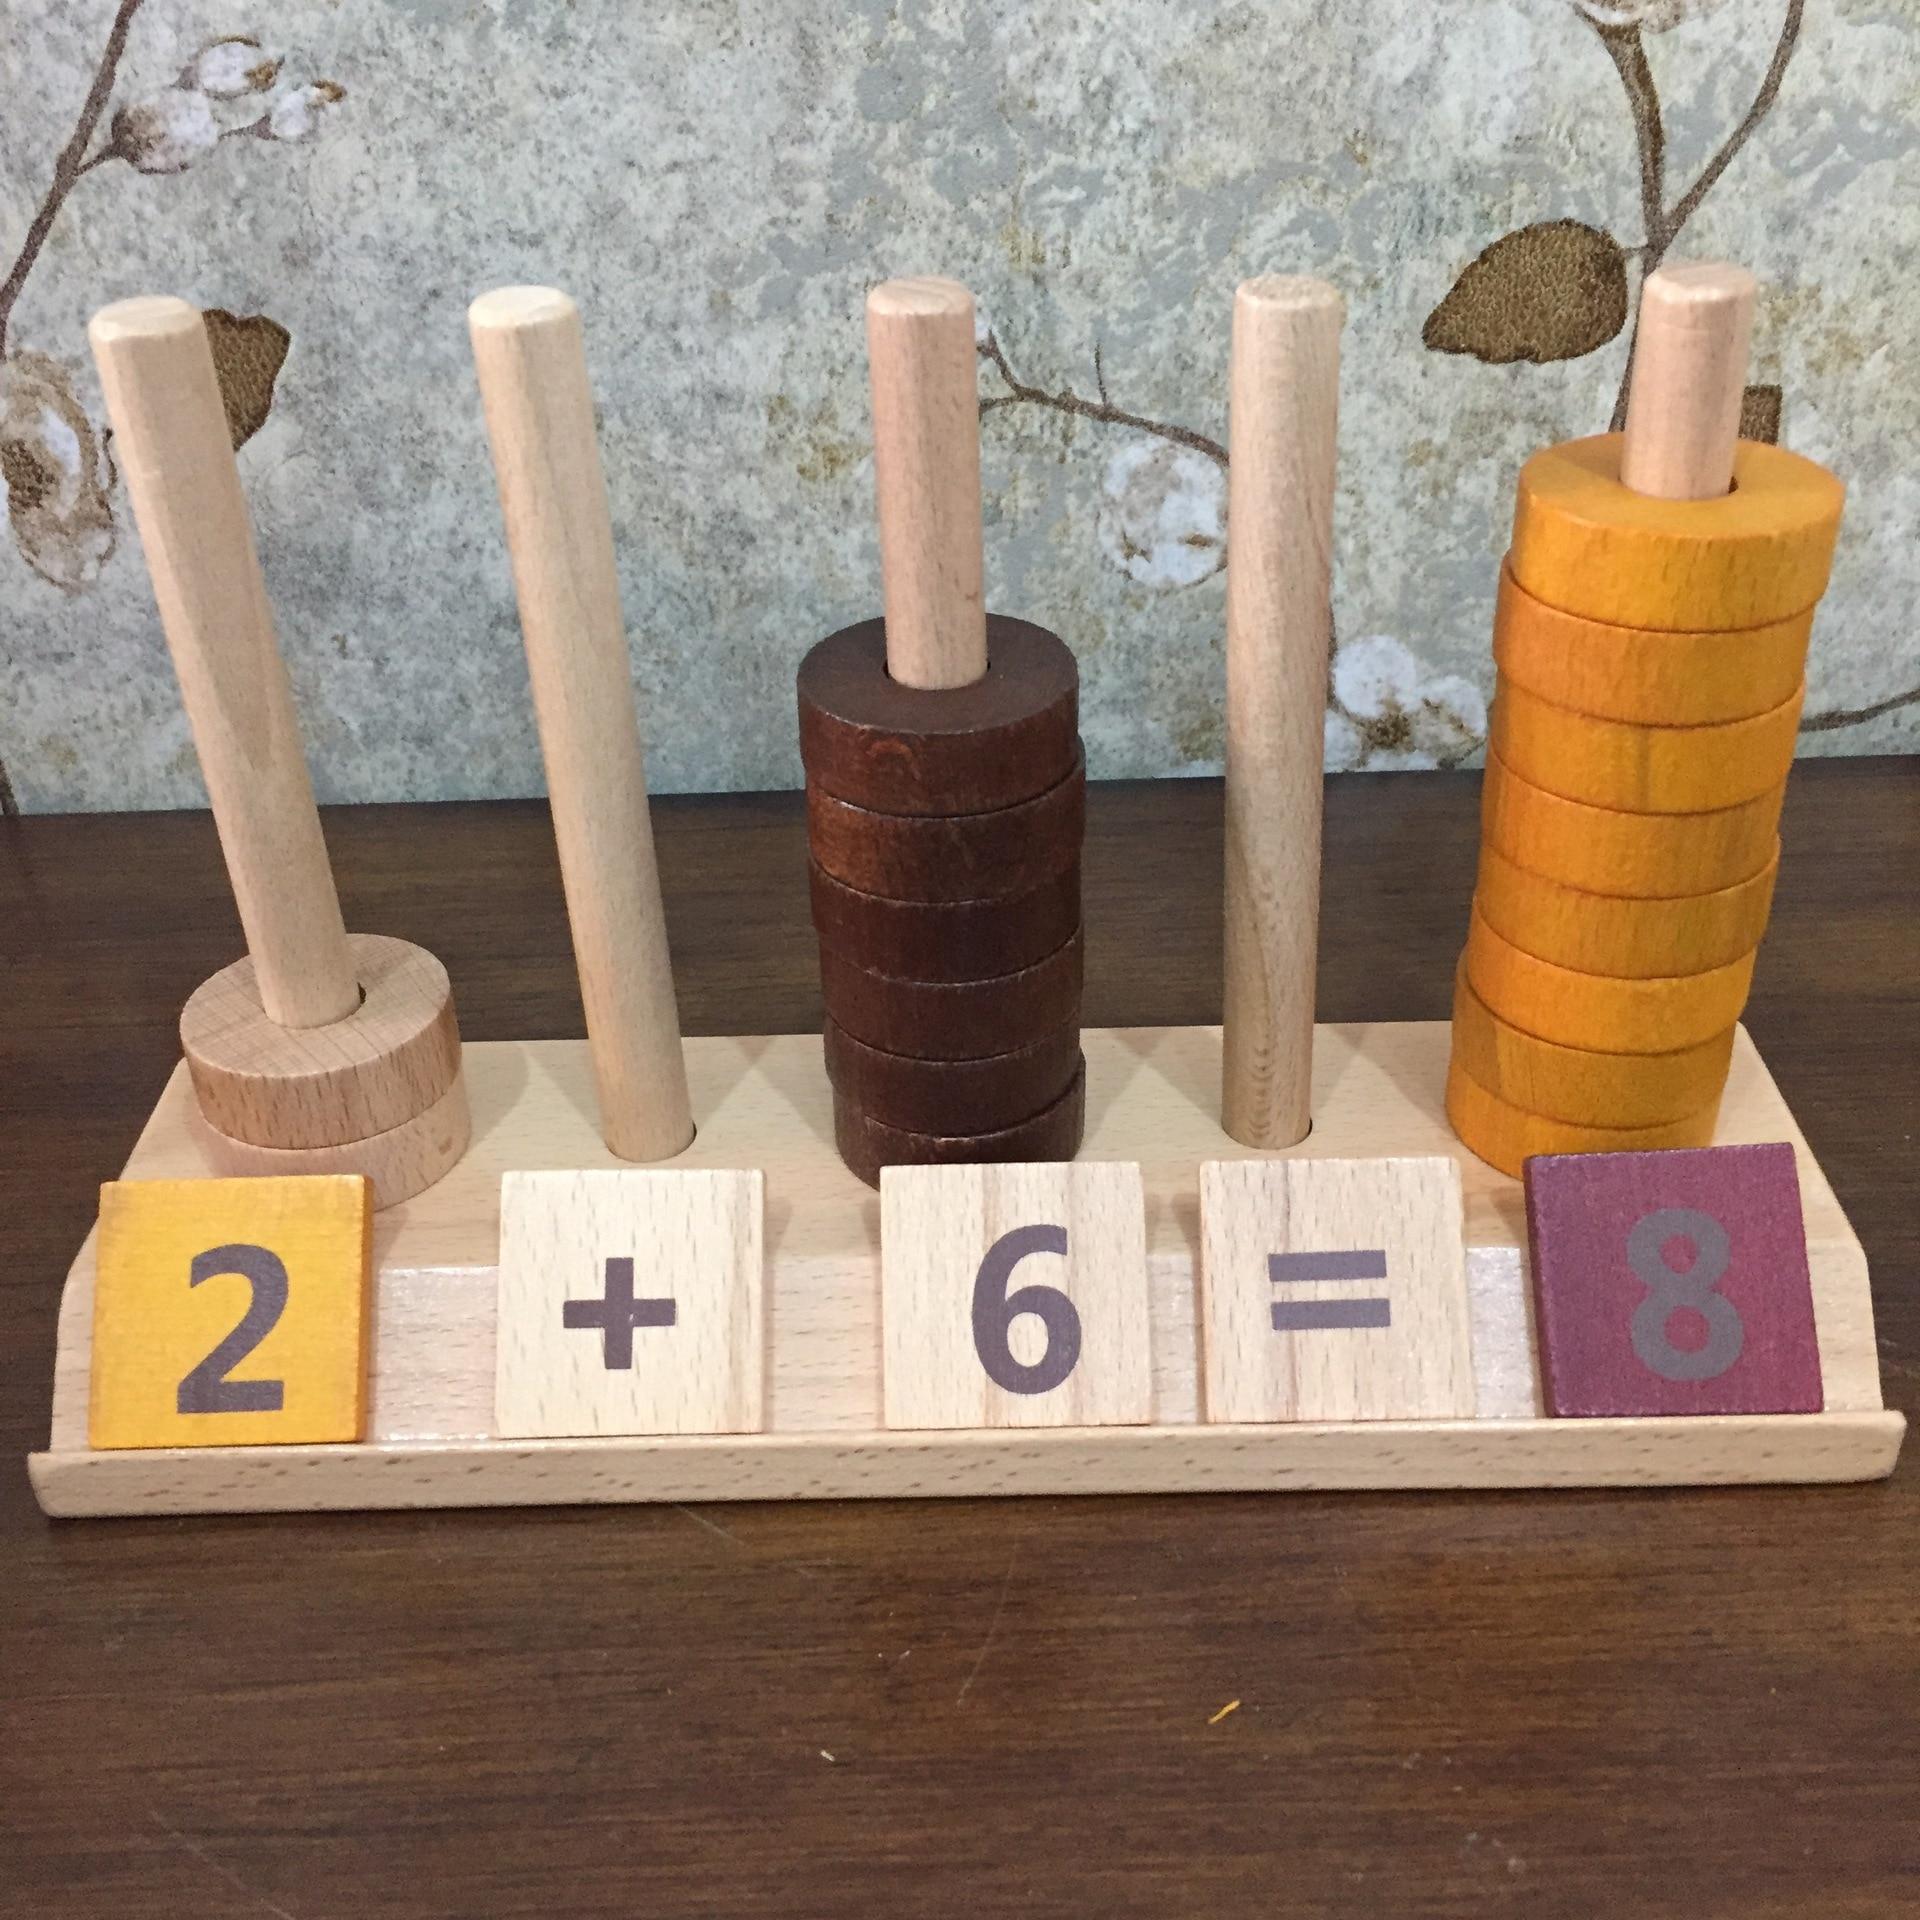 Montessori Teaching Aids Bead Toy DIY Children Teaching Aids With Numbers Beaded Bracelet Taiwan Montessori Mathematics Teaching